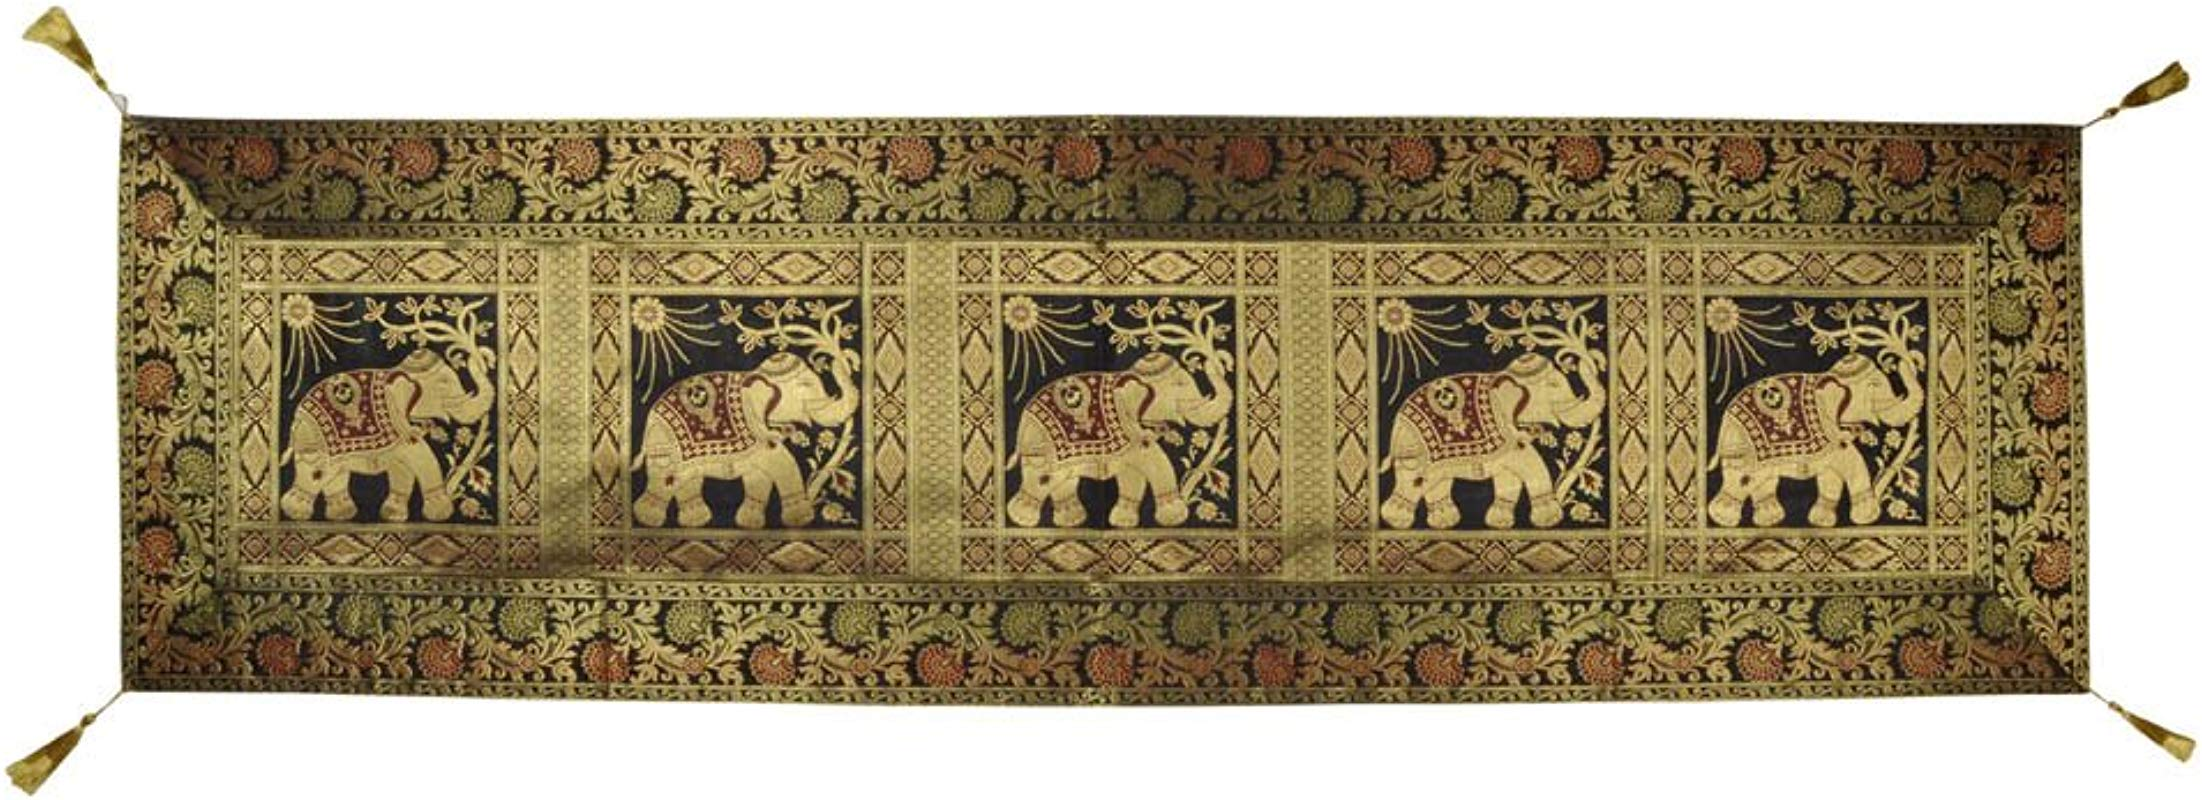 Lalhaveli Decorative Elephant Design Silk Table Runner 60 X 16 Inch Black Color